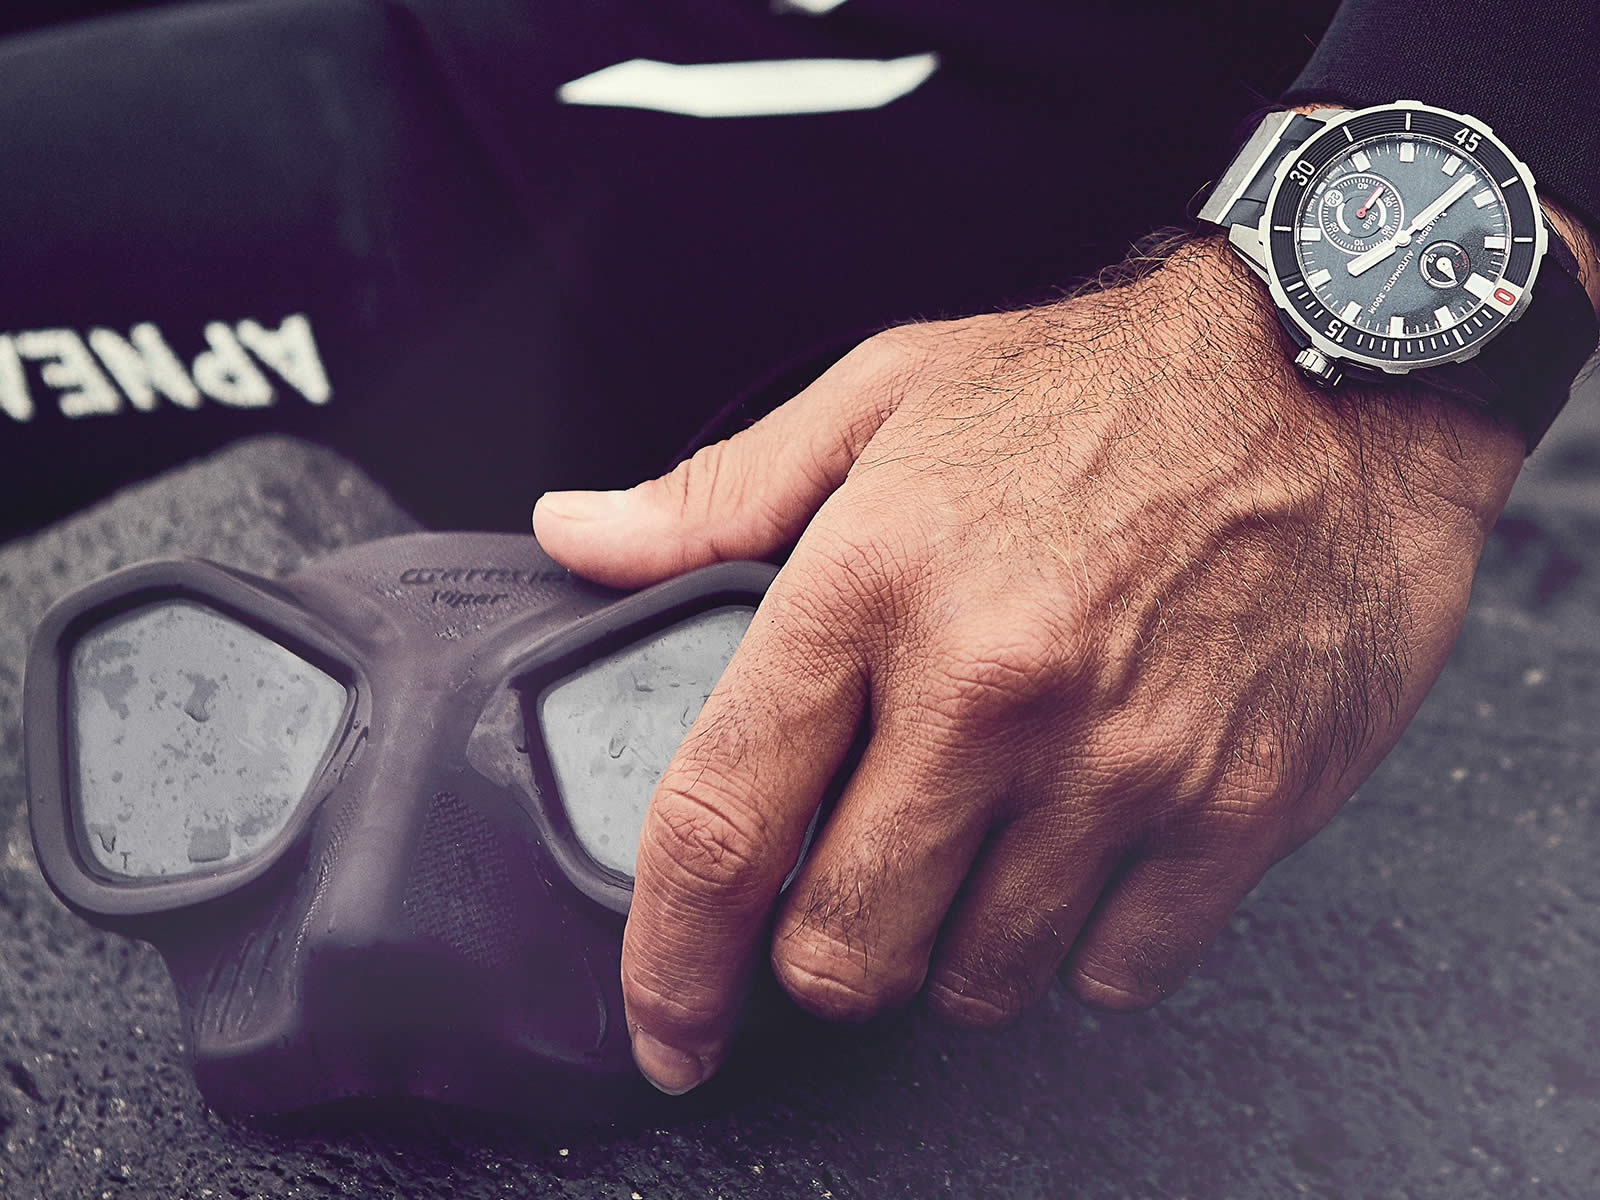 ulysse-nardin-diver-chronometer-2018-models-11-.jpg